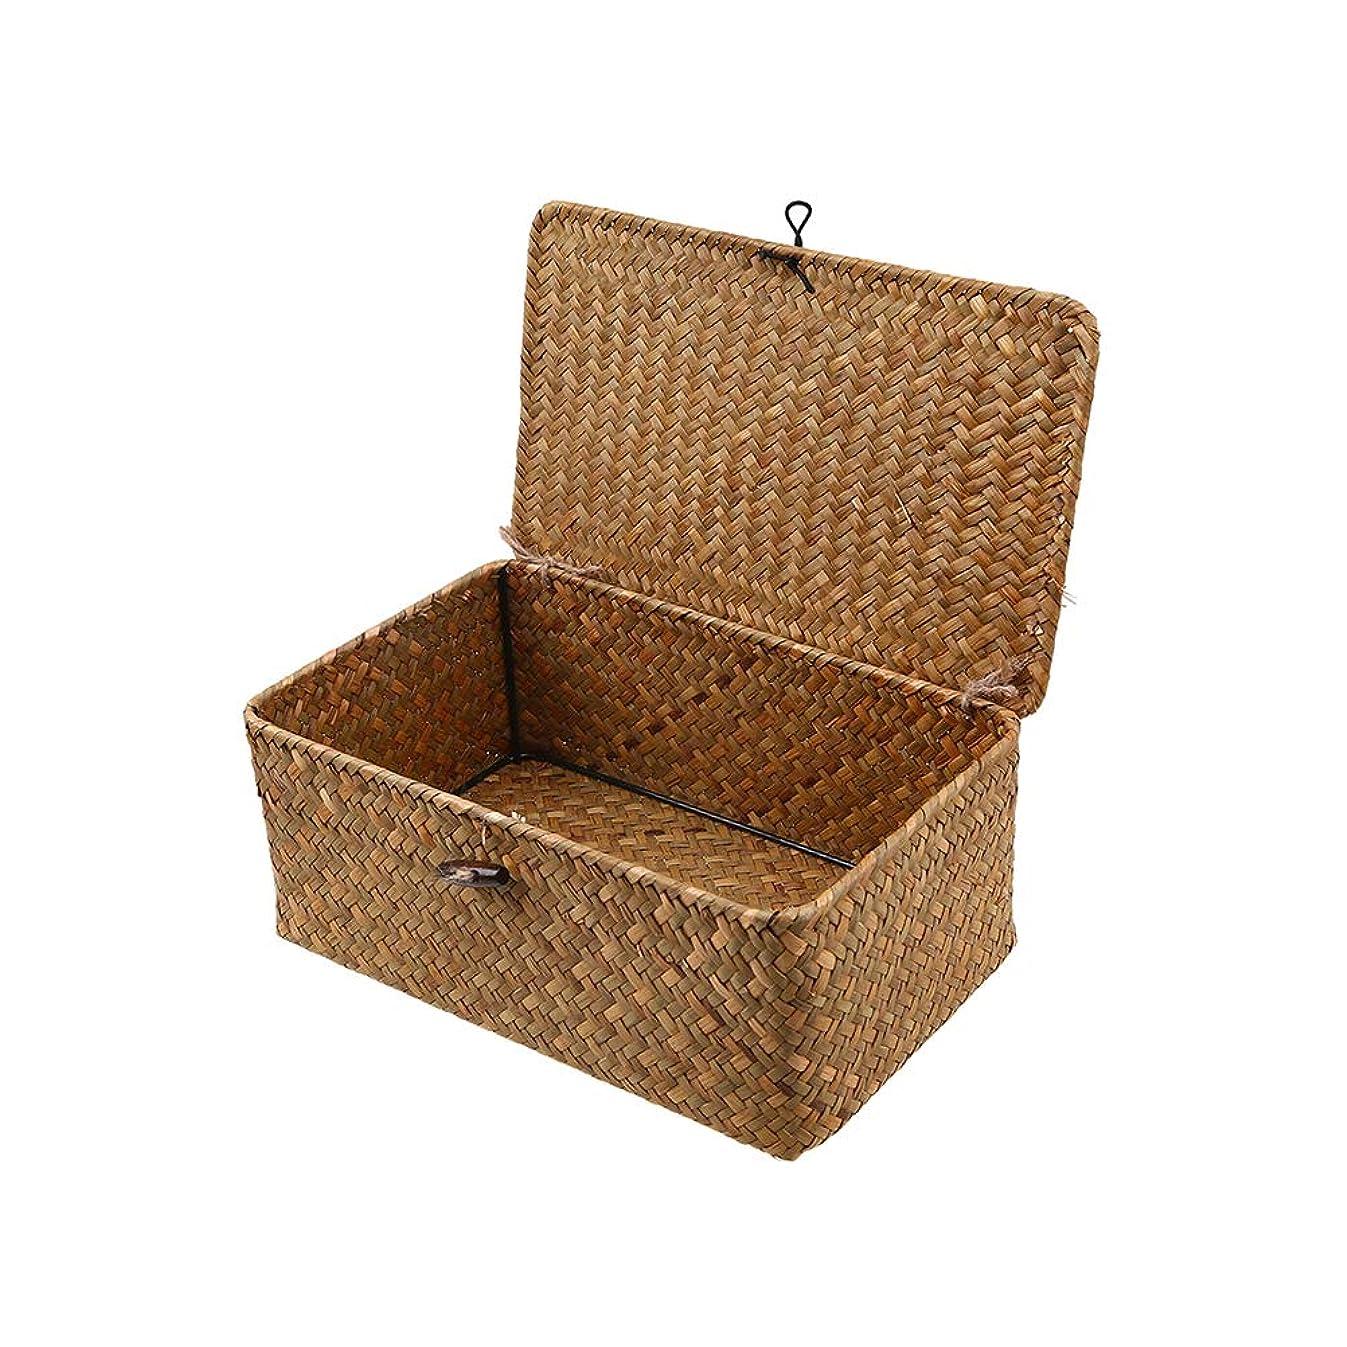 Vosarea Rattan Storage Basket Makeup Organizer Multipurpose Container with Lid